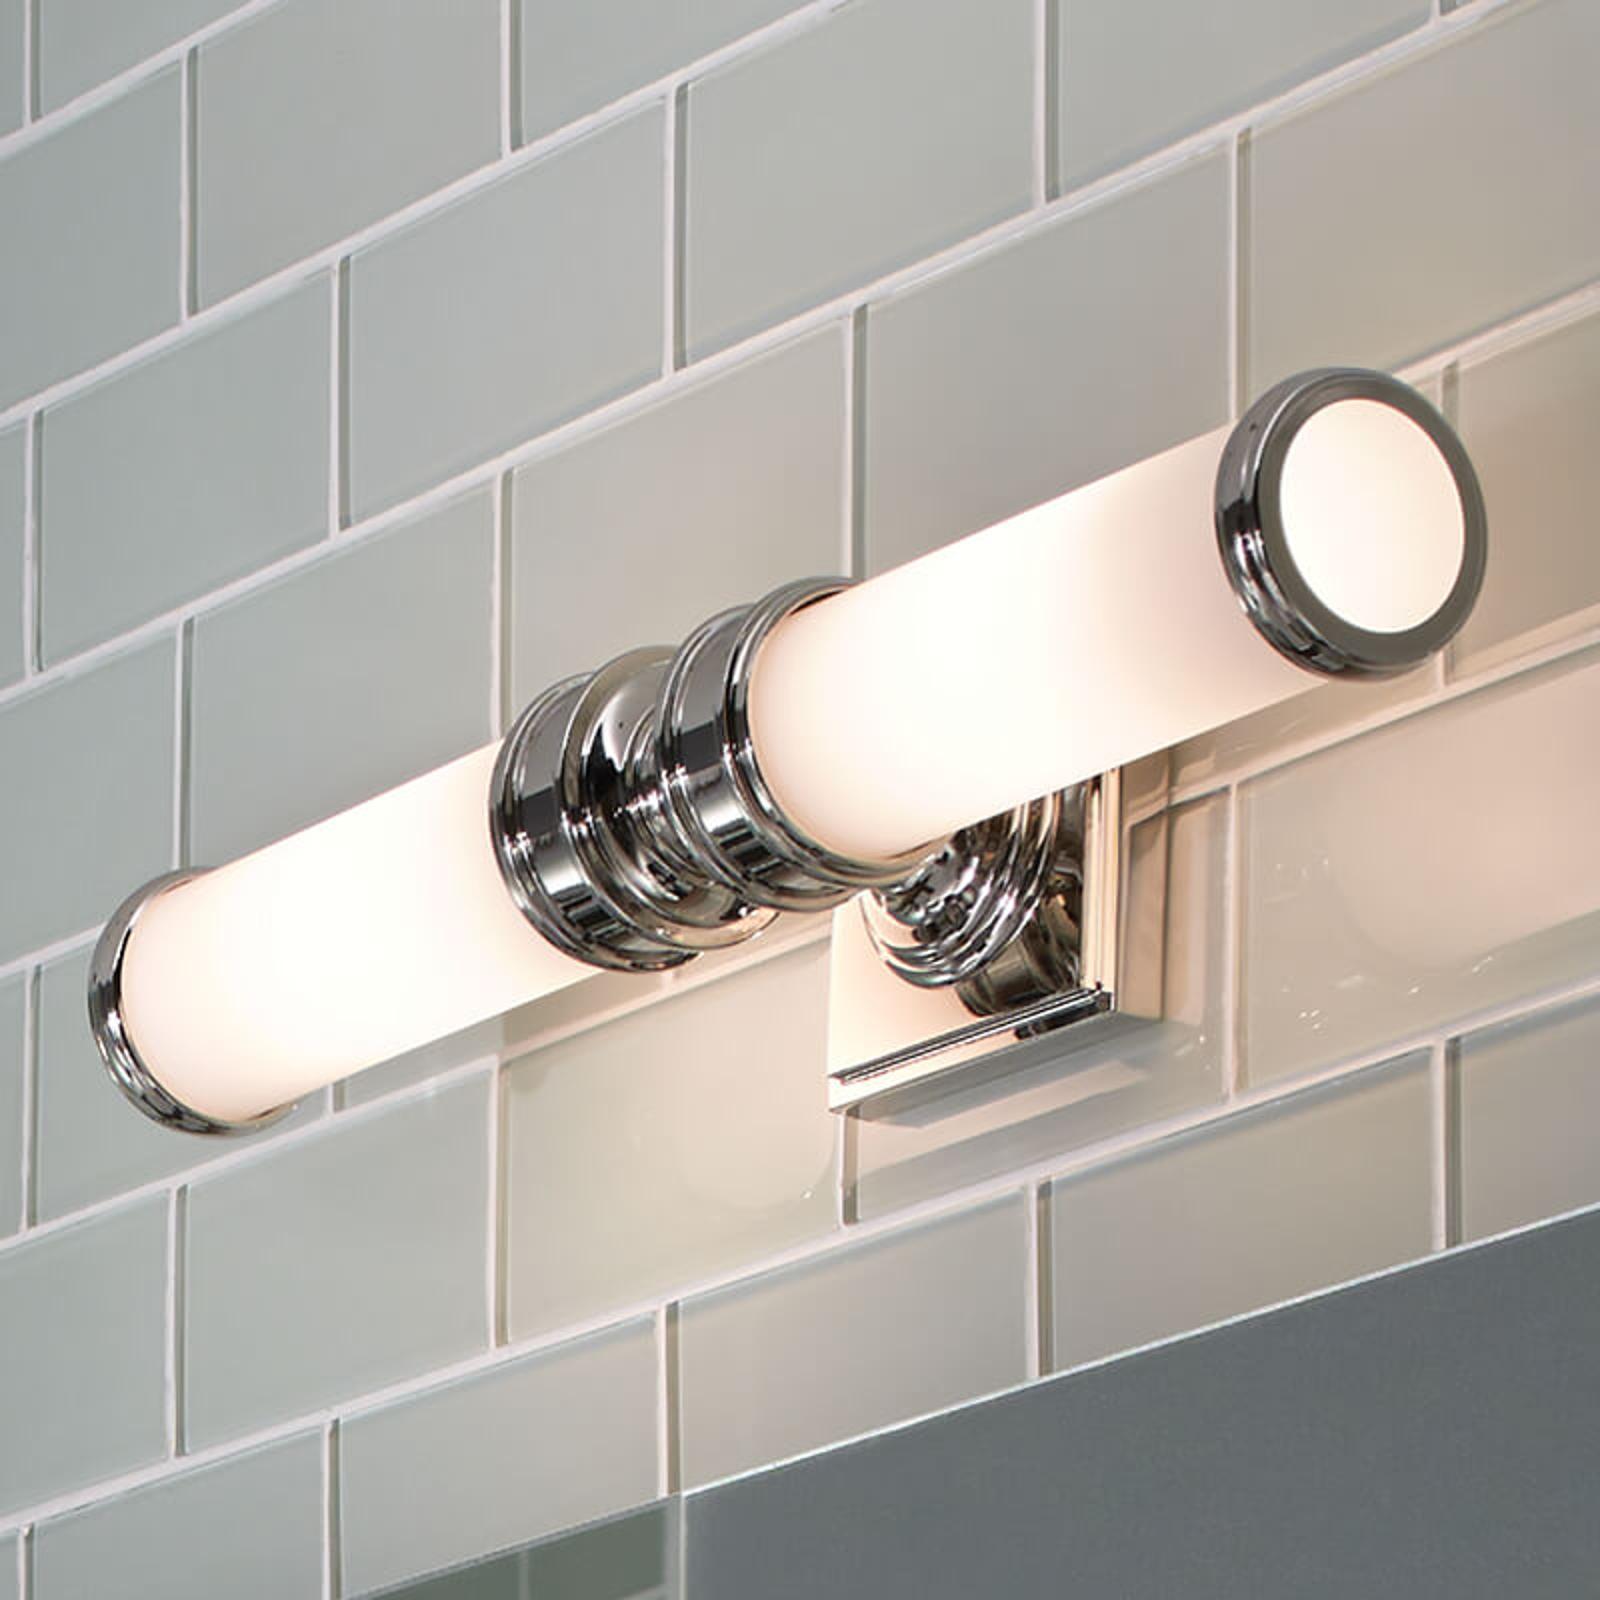 LED-spegellampa Payne, 2 lampor